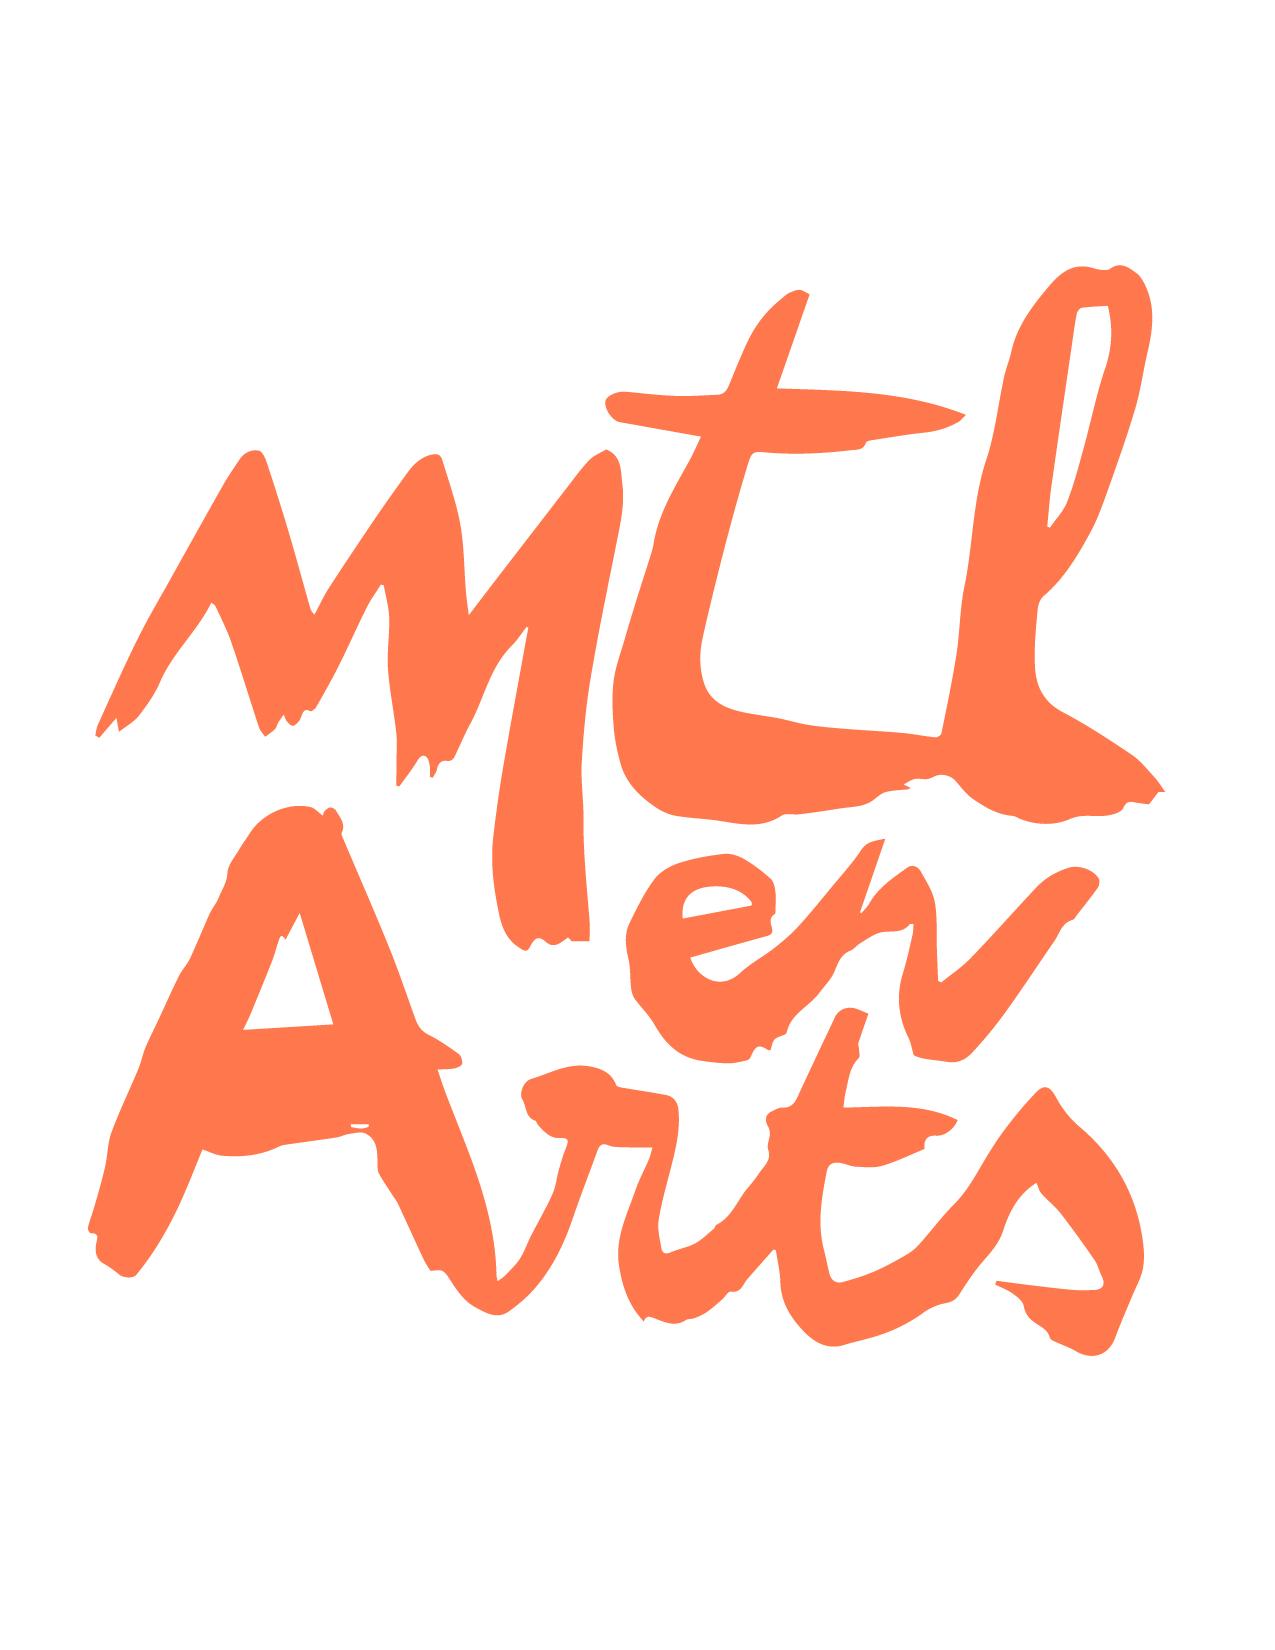 Logo-Mtl-en-Arts-ORANGE-jpeg-1.jpg